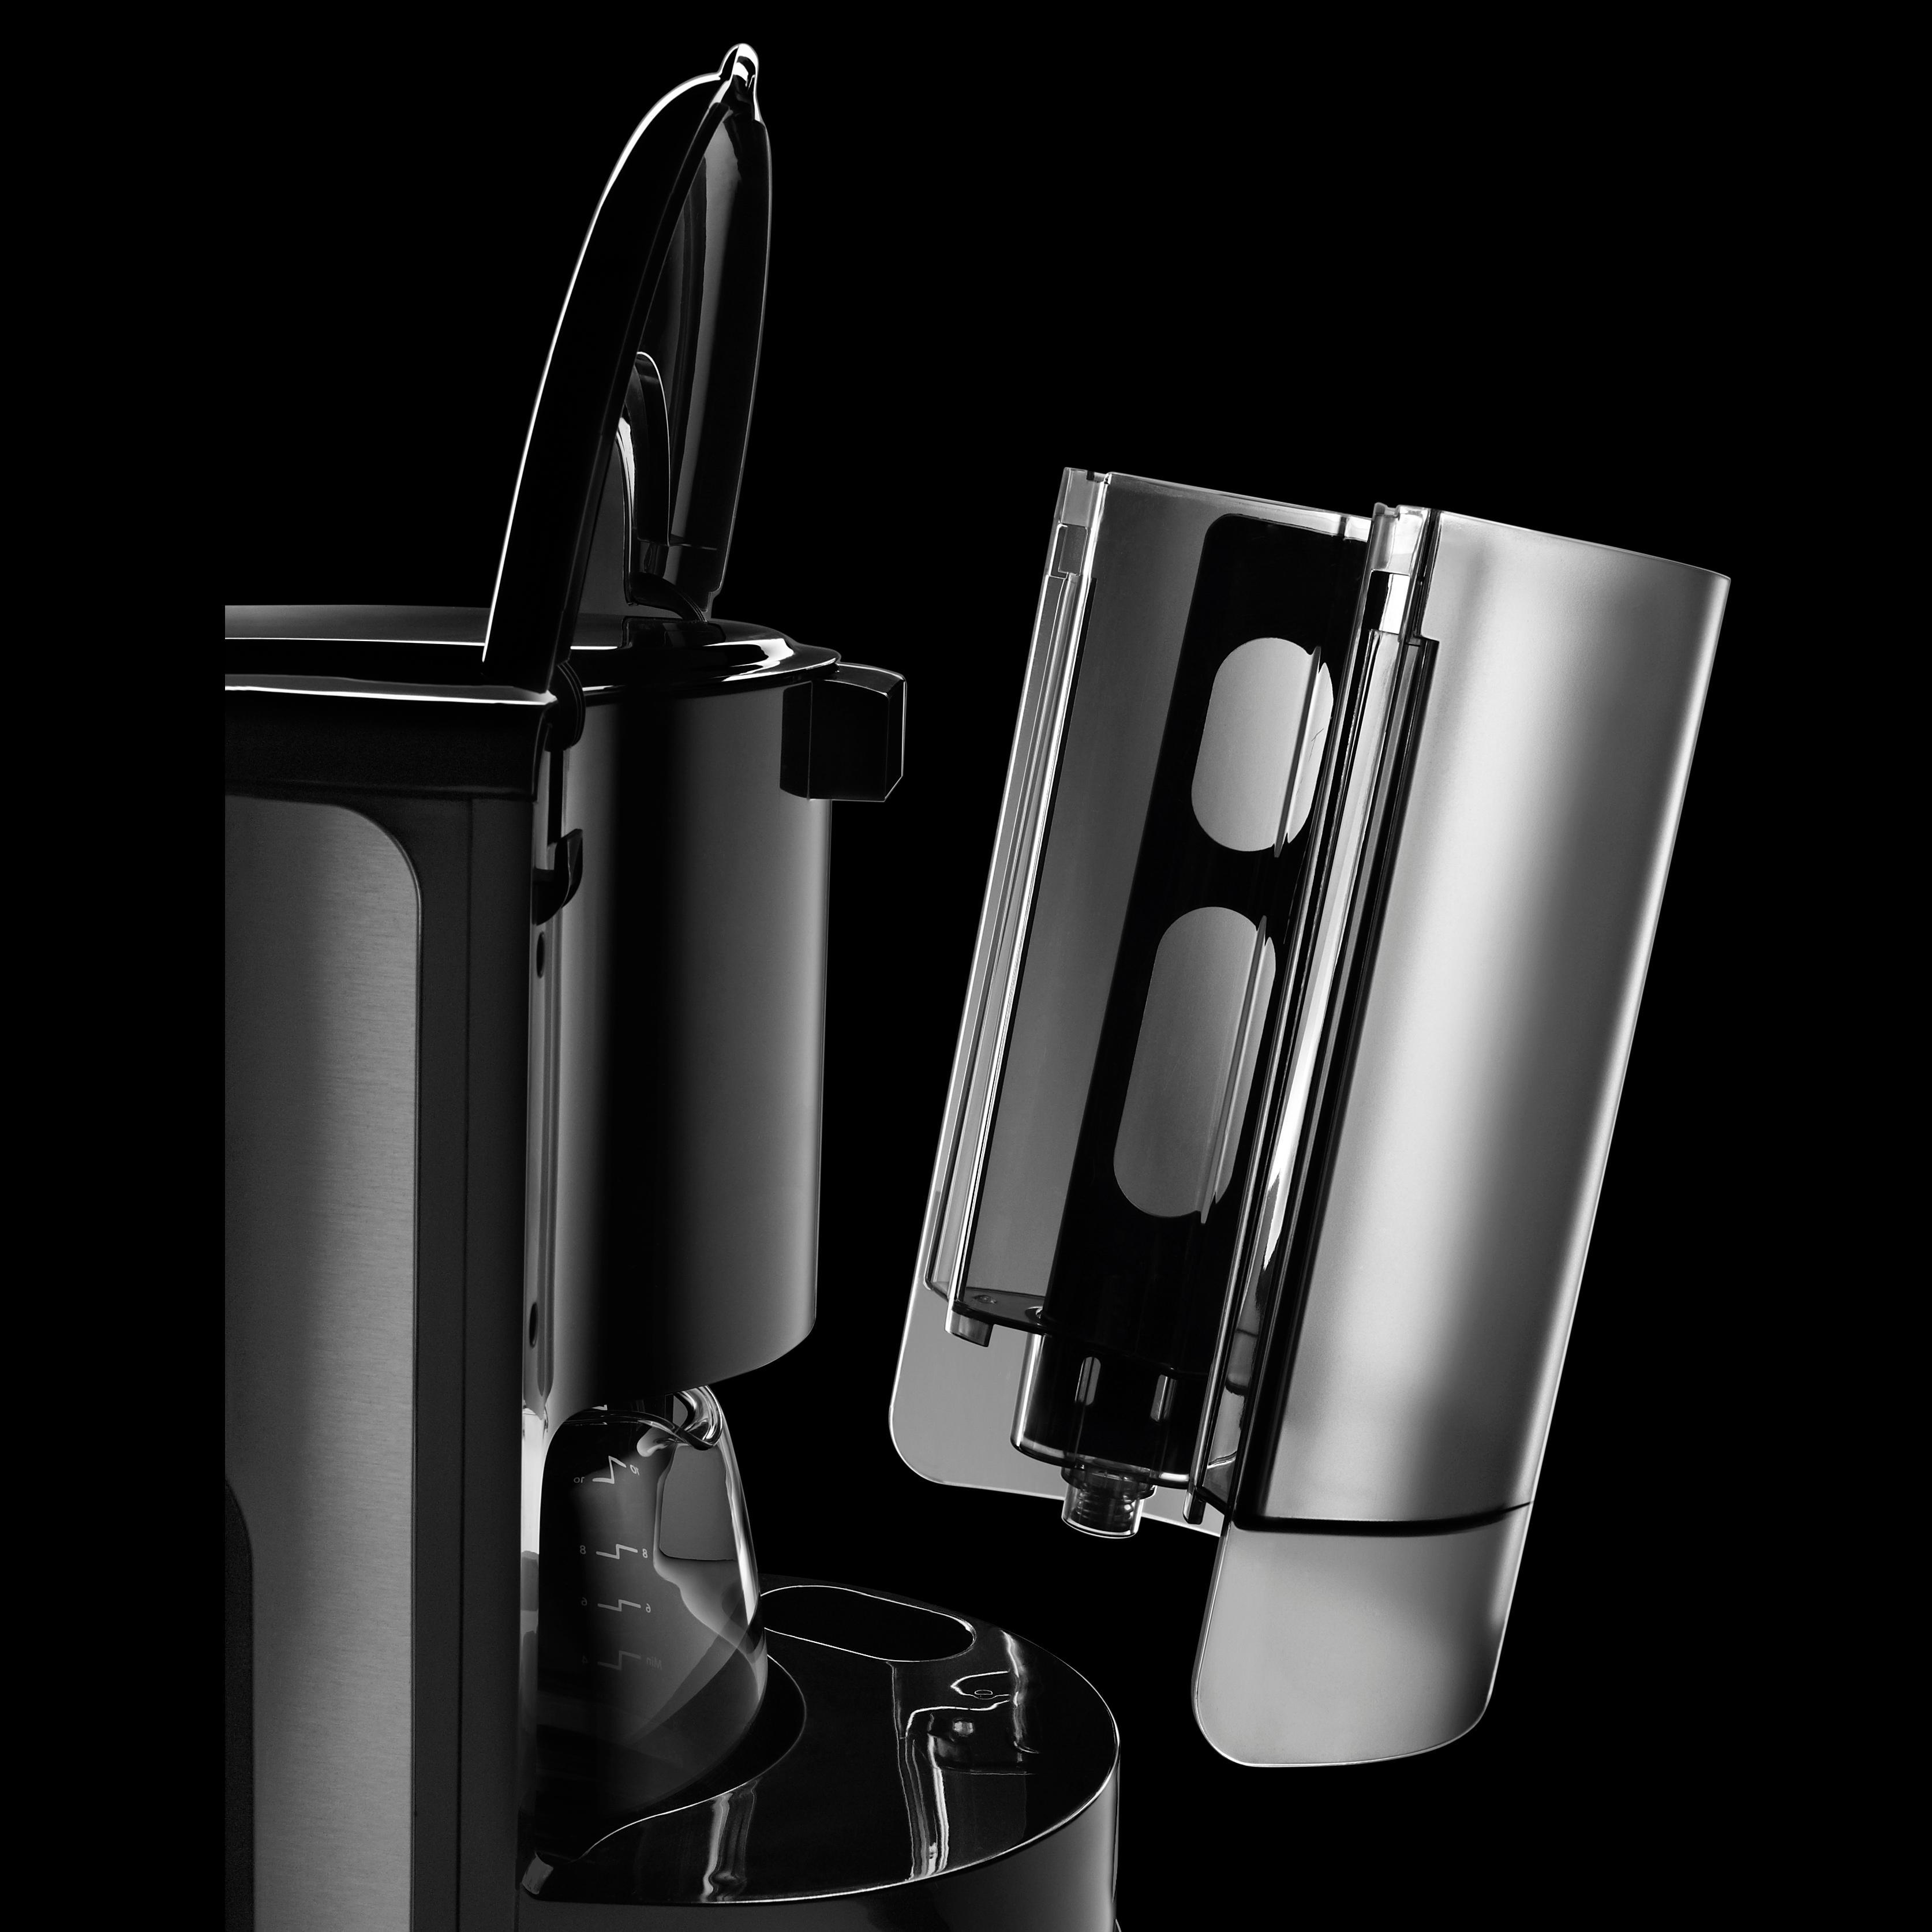 Kitchenaid 12 cup glass carafe coffee maker | Kitchen ideas